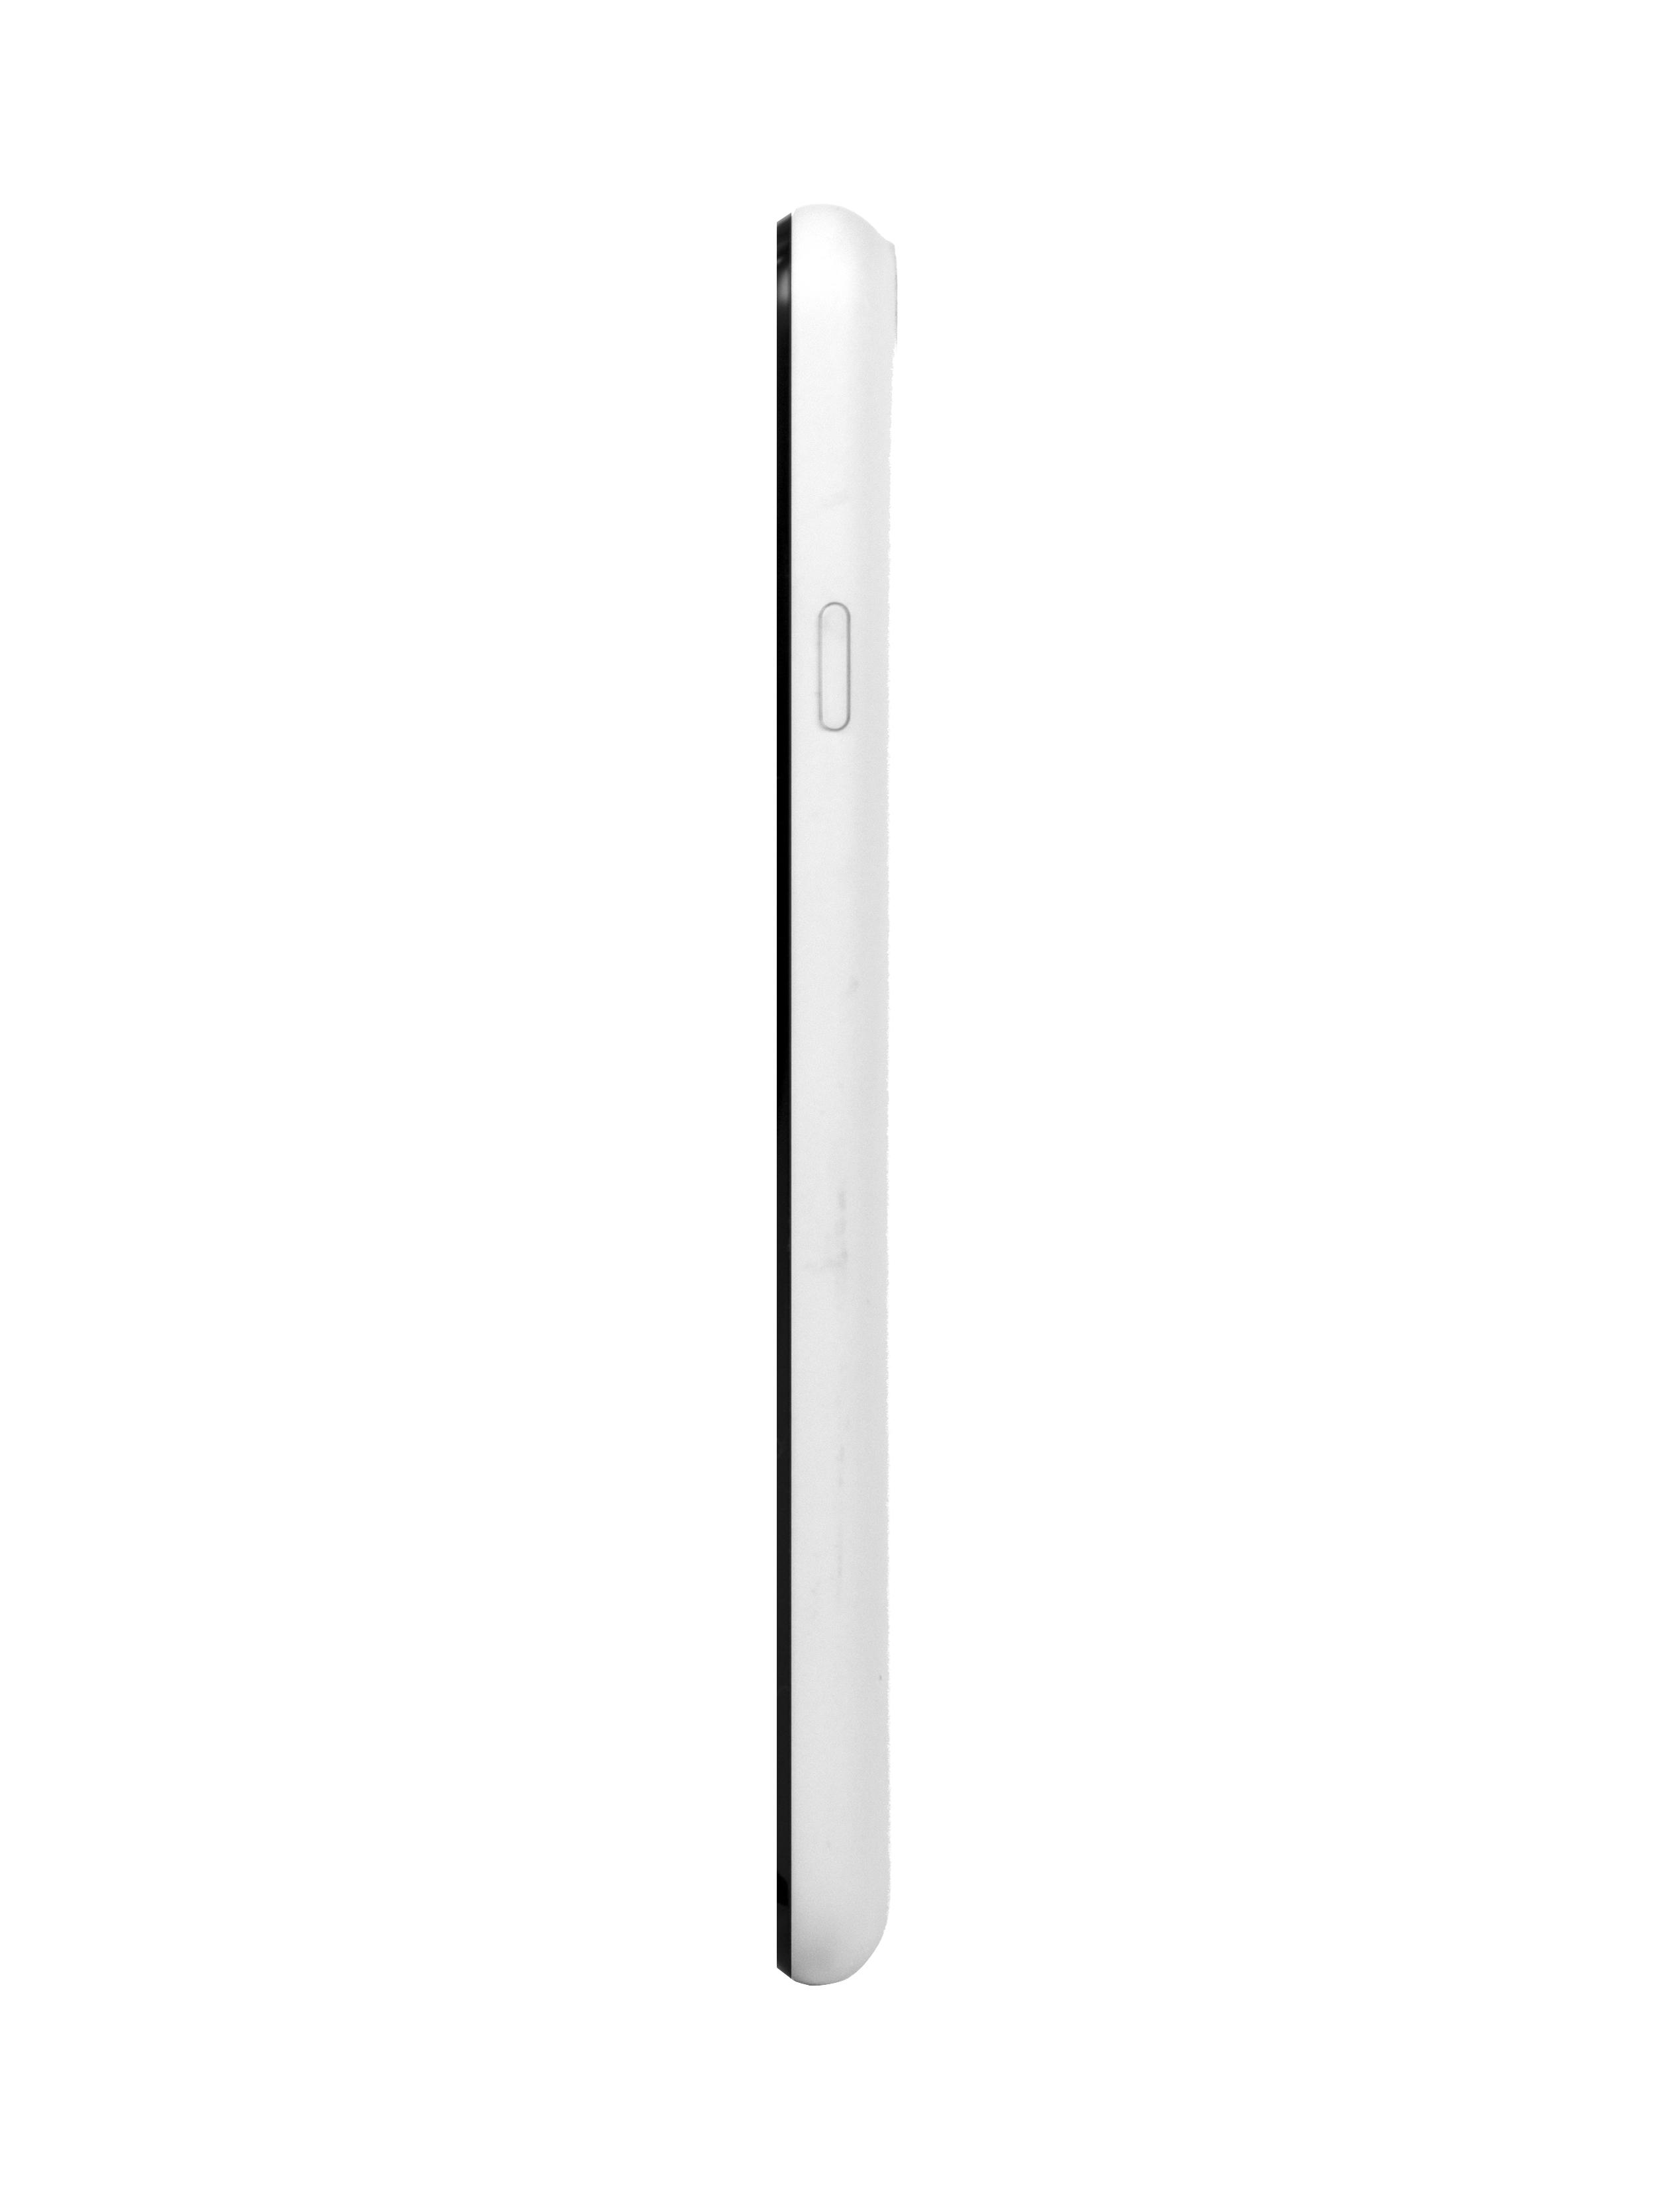 Lanix ilium S520 blanco lateral derecha